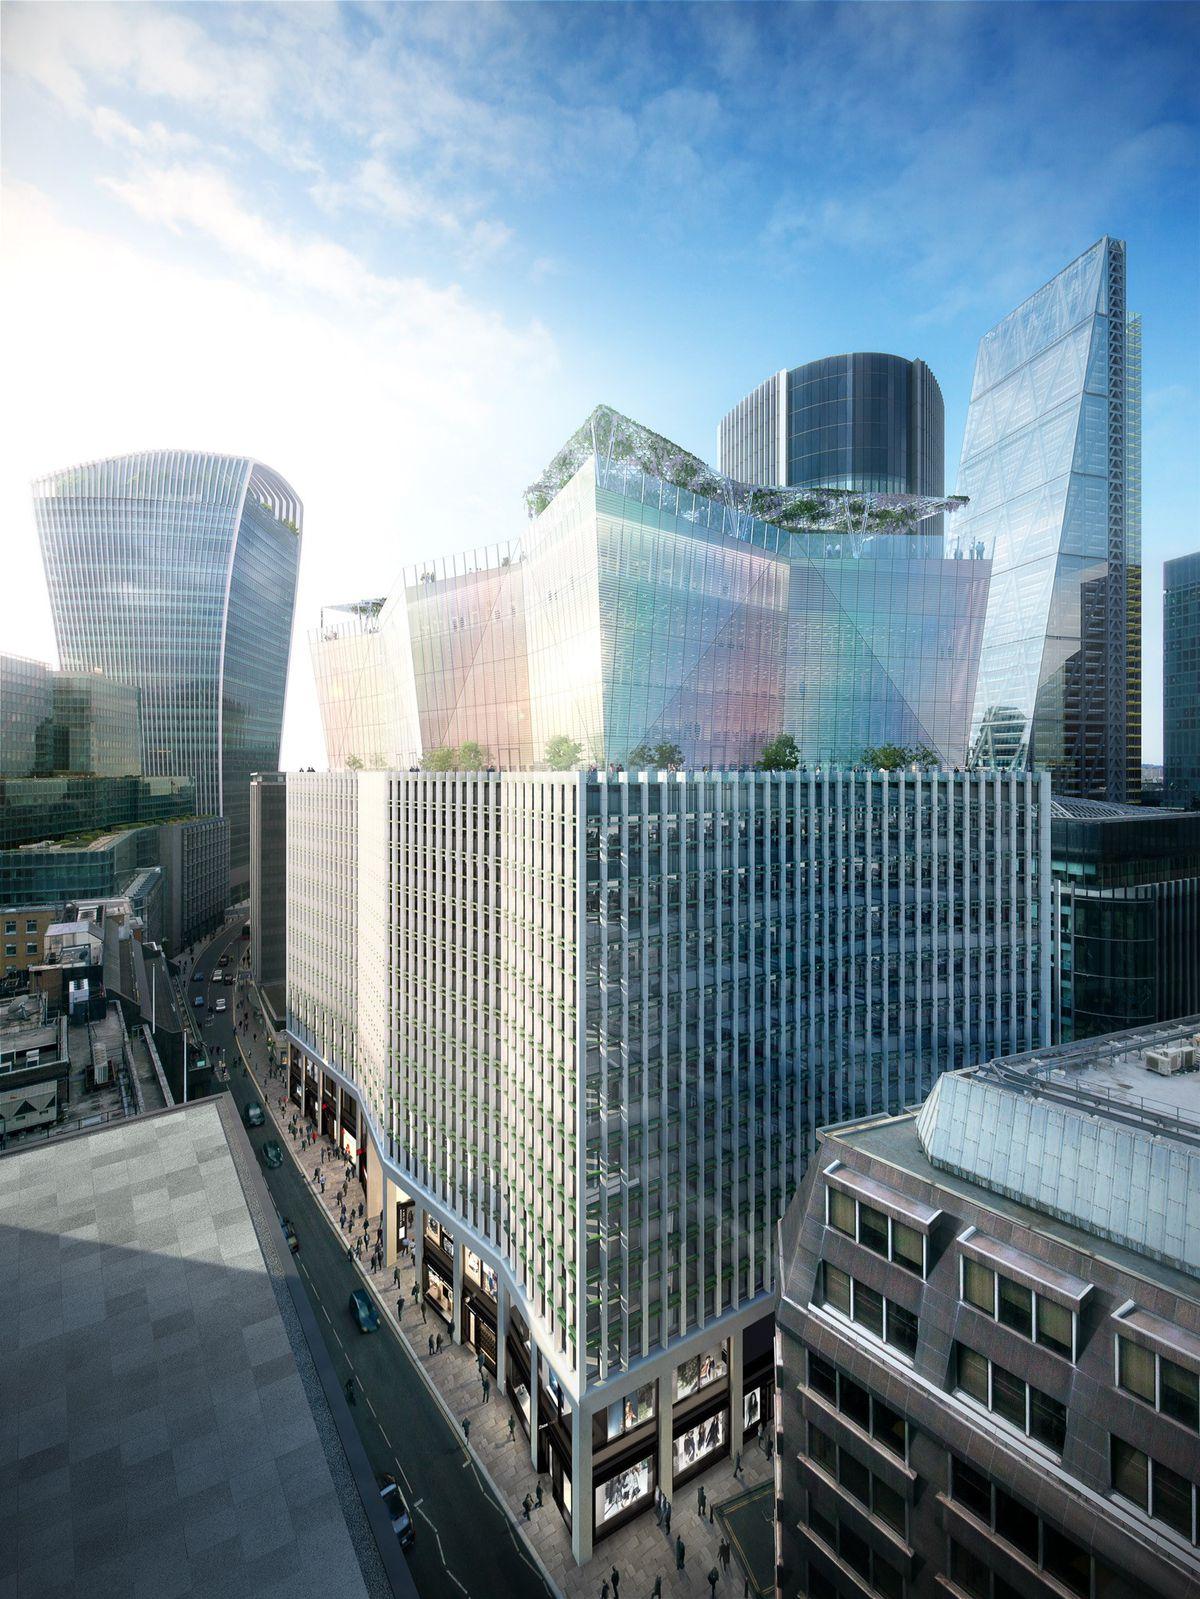 D Amp D London Announces New Rooftop Restaurant At 120